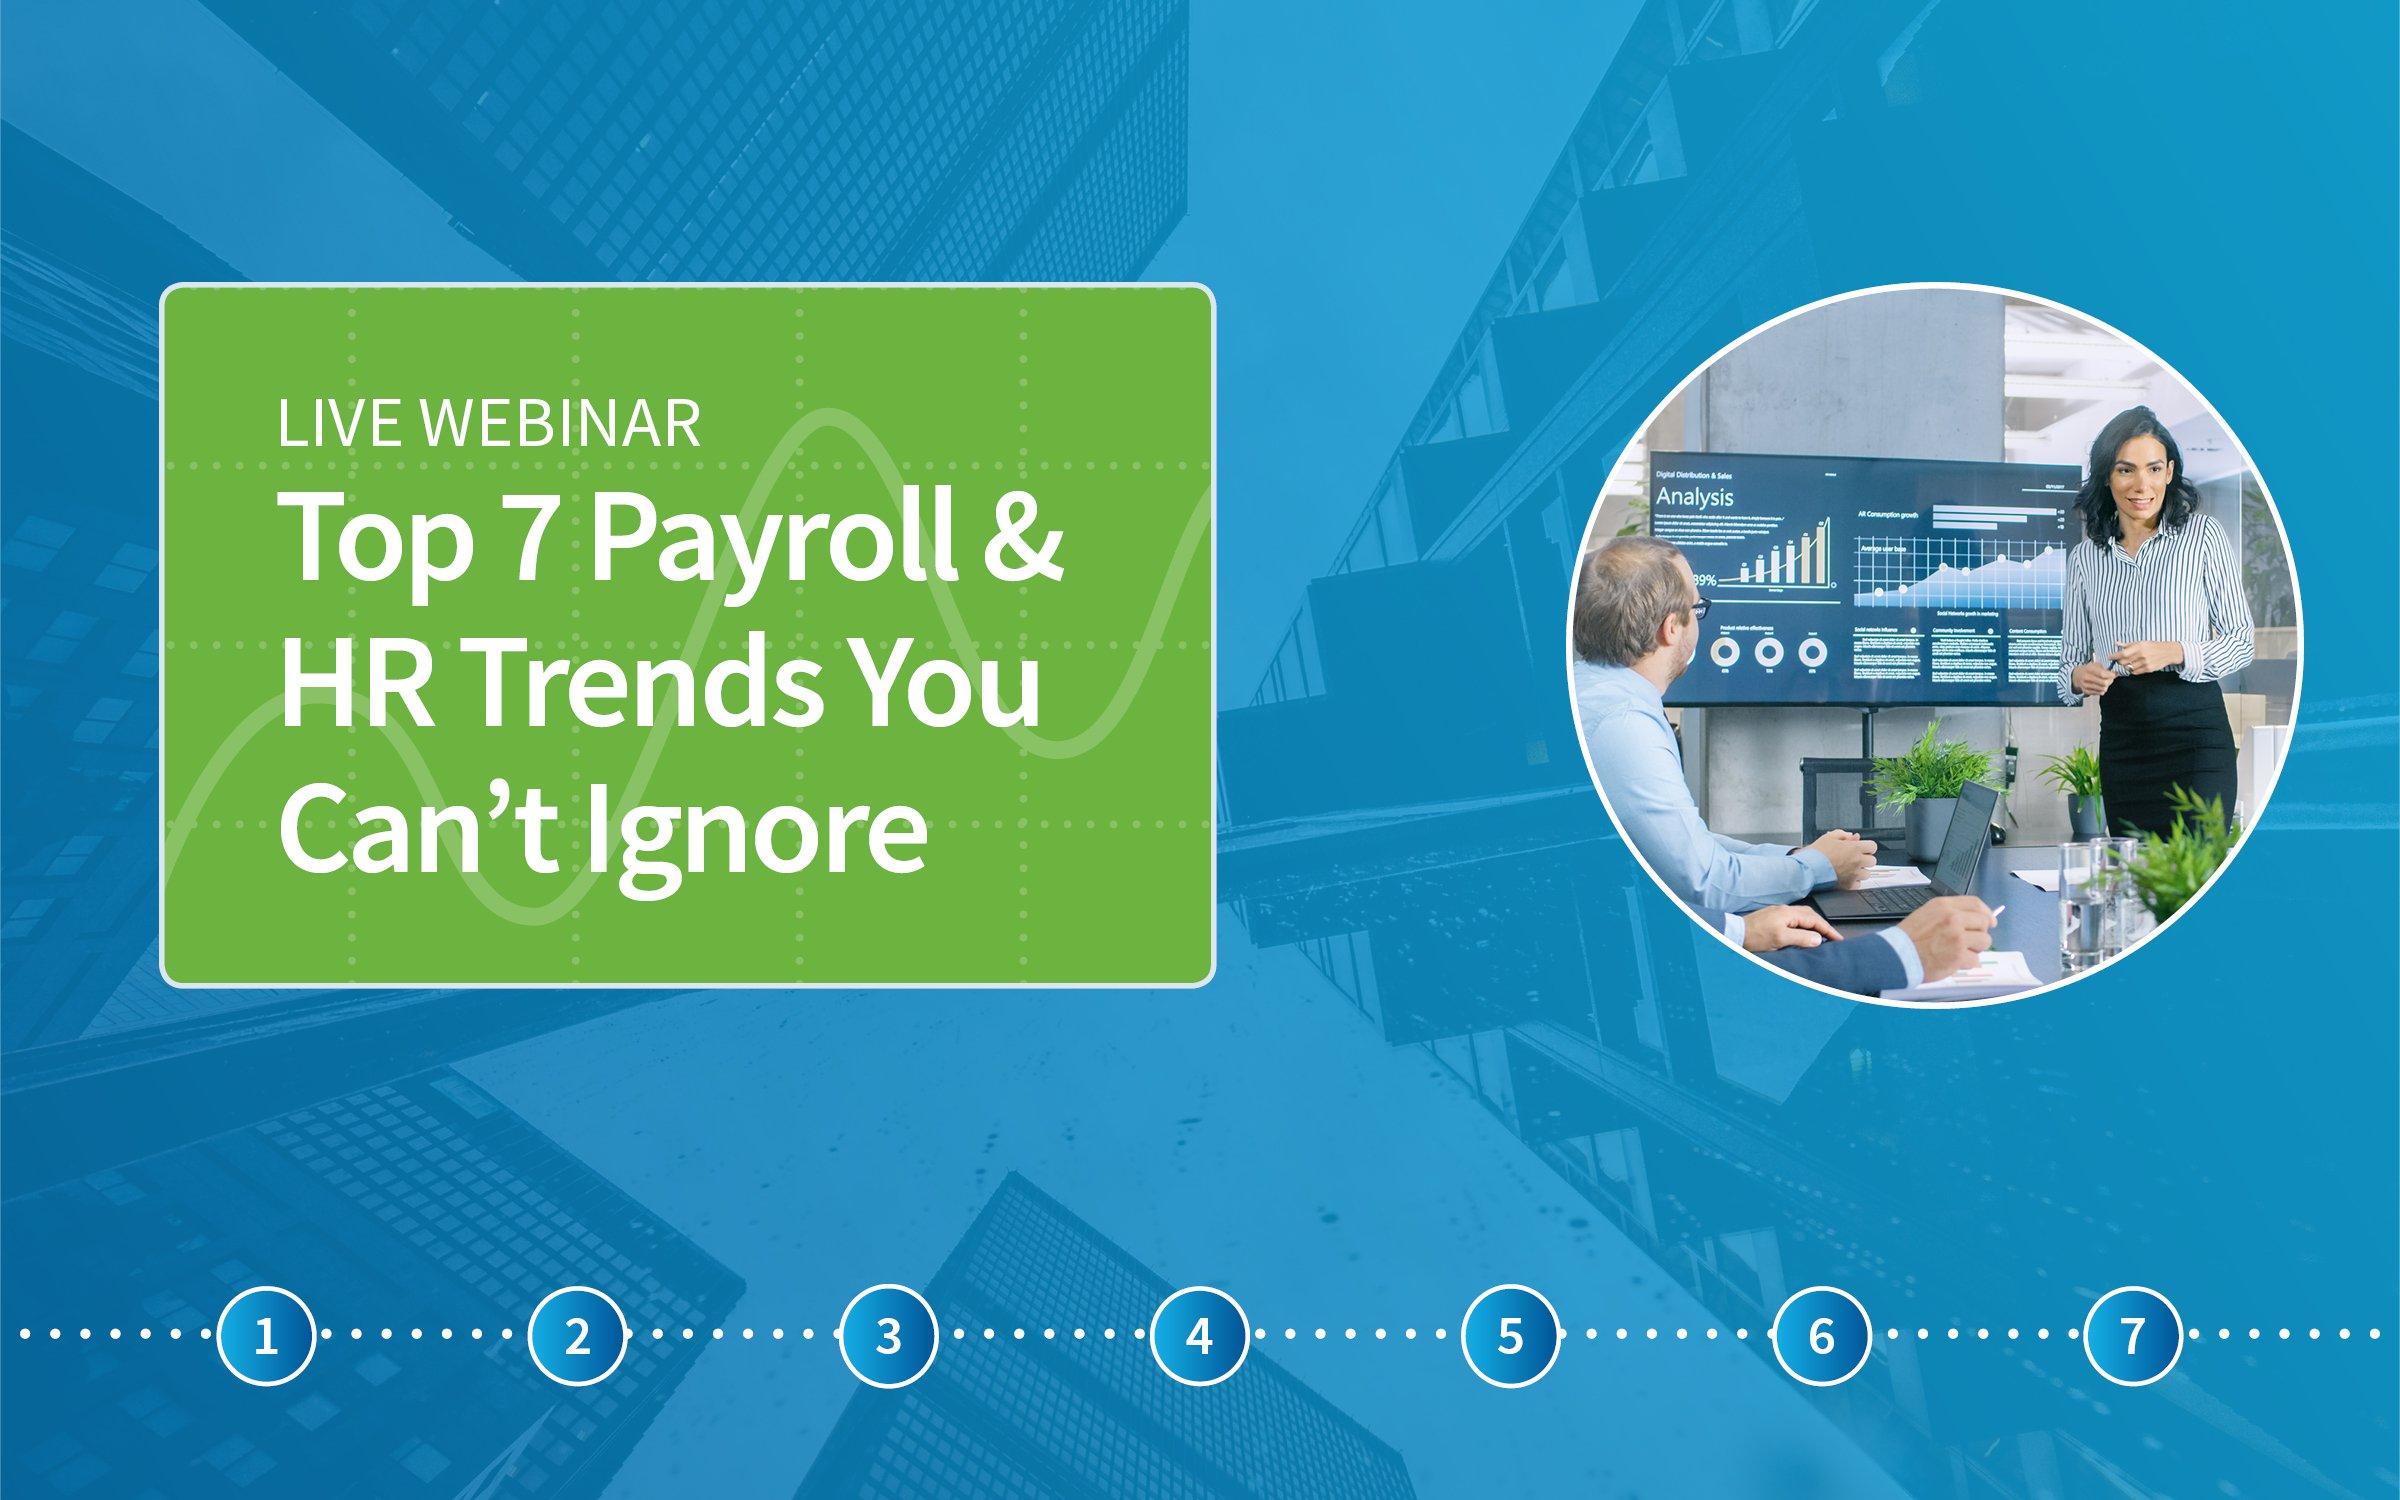 Top 7 Payroll & HR Trends - Webinar Image Thumbnail